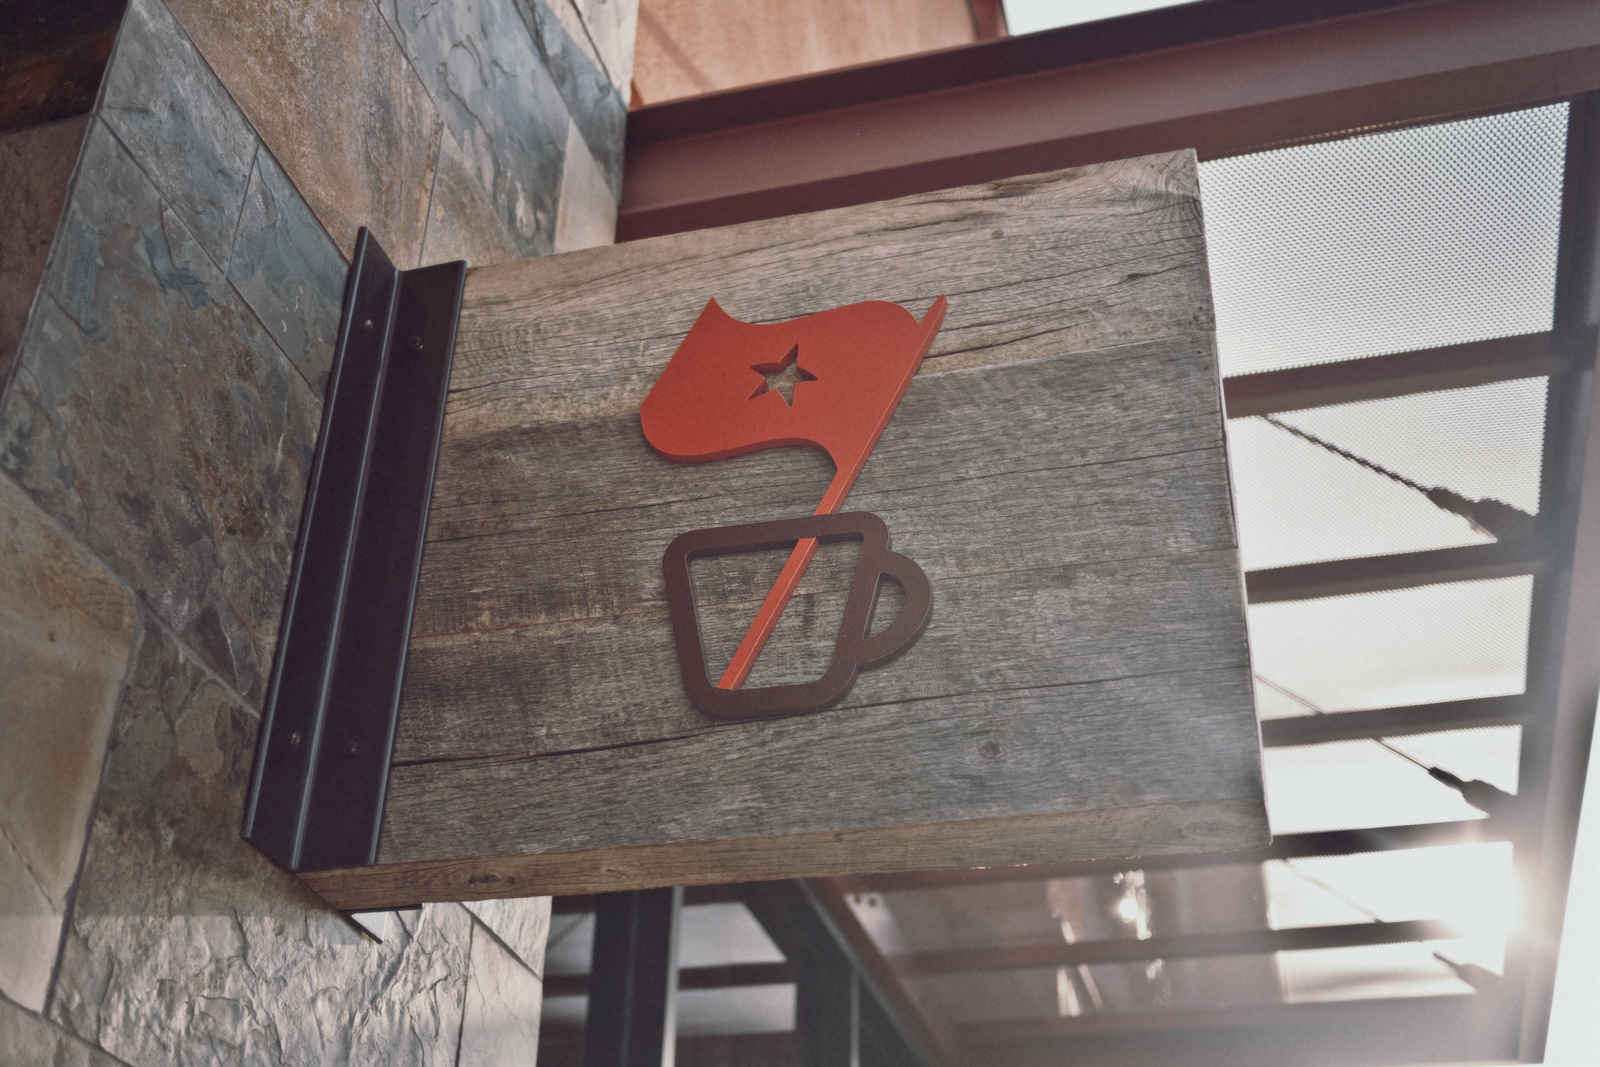 Espresso Republic Signage by Salih Kucukaga